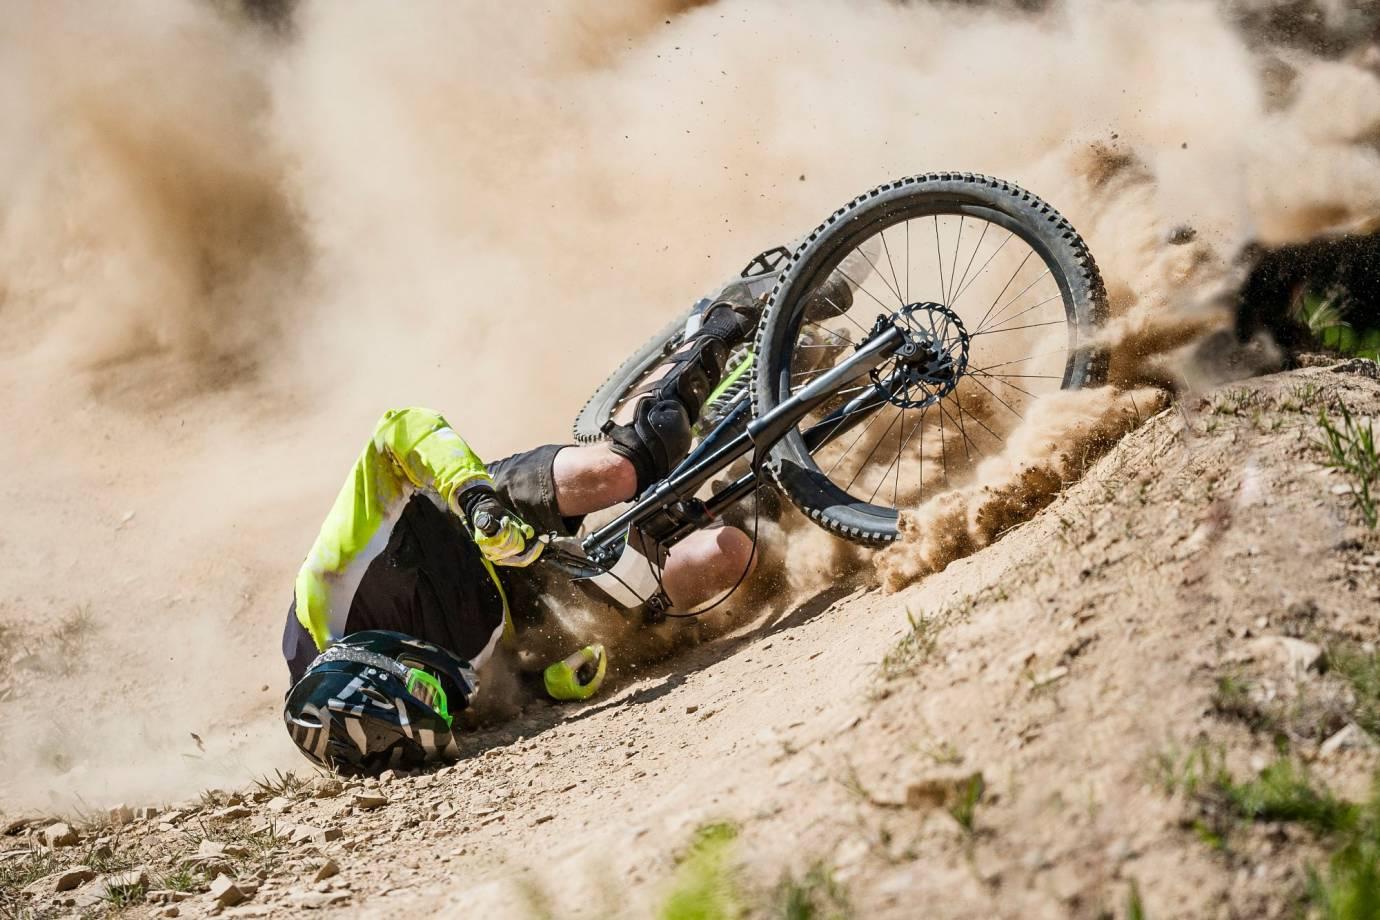 enve all terrain bike reality show